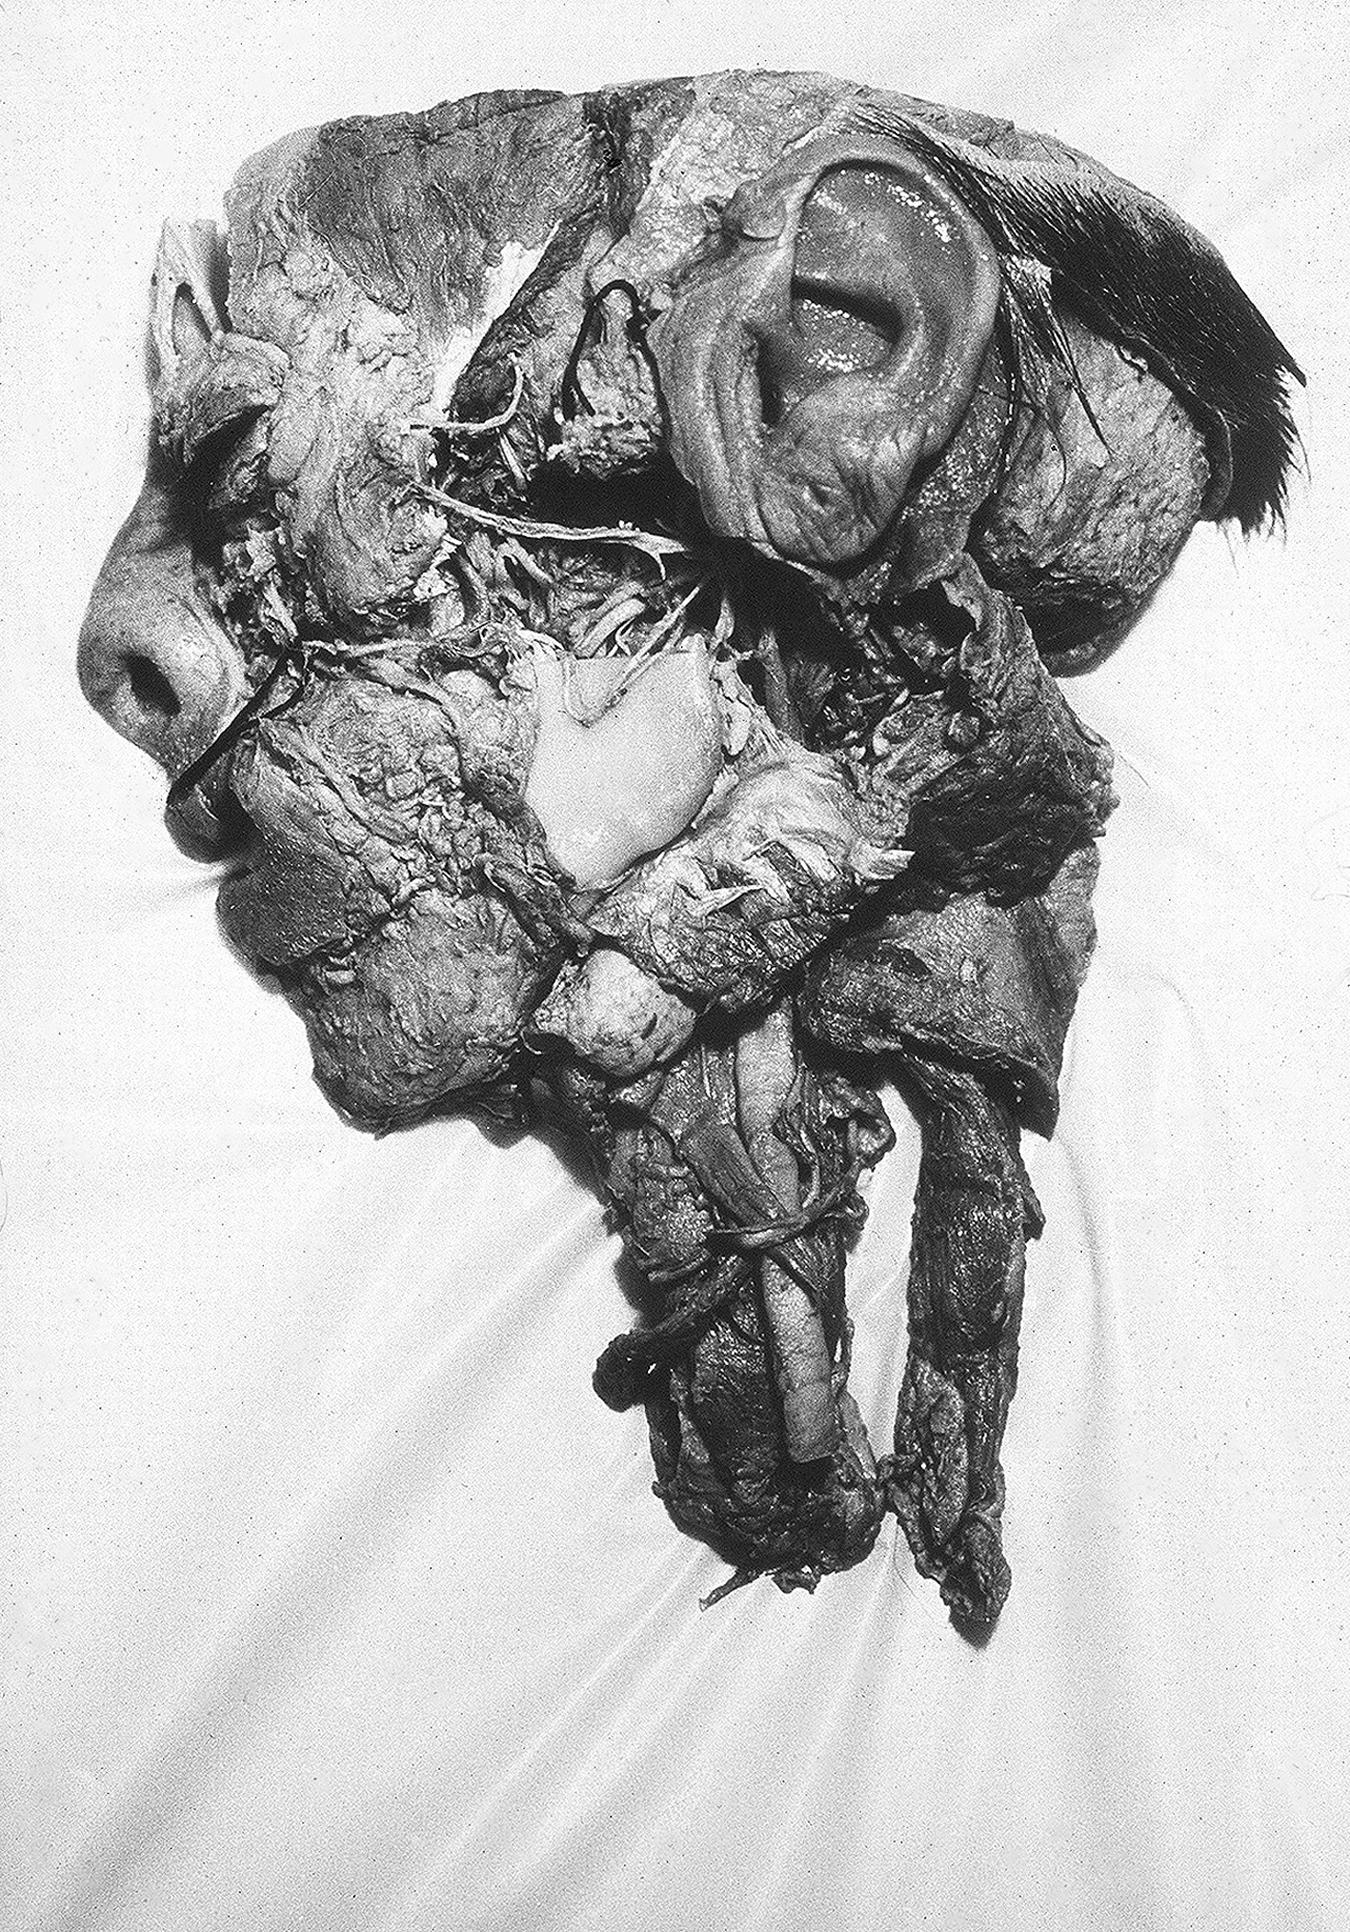 Tony_Ward_early_photography_work_beginning_anatomy_half_head_profile-epidemic